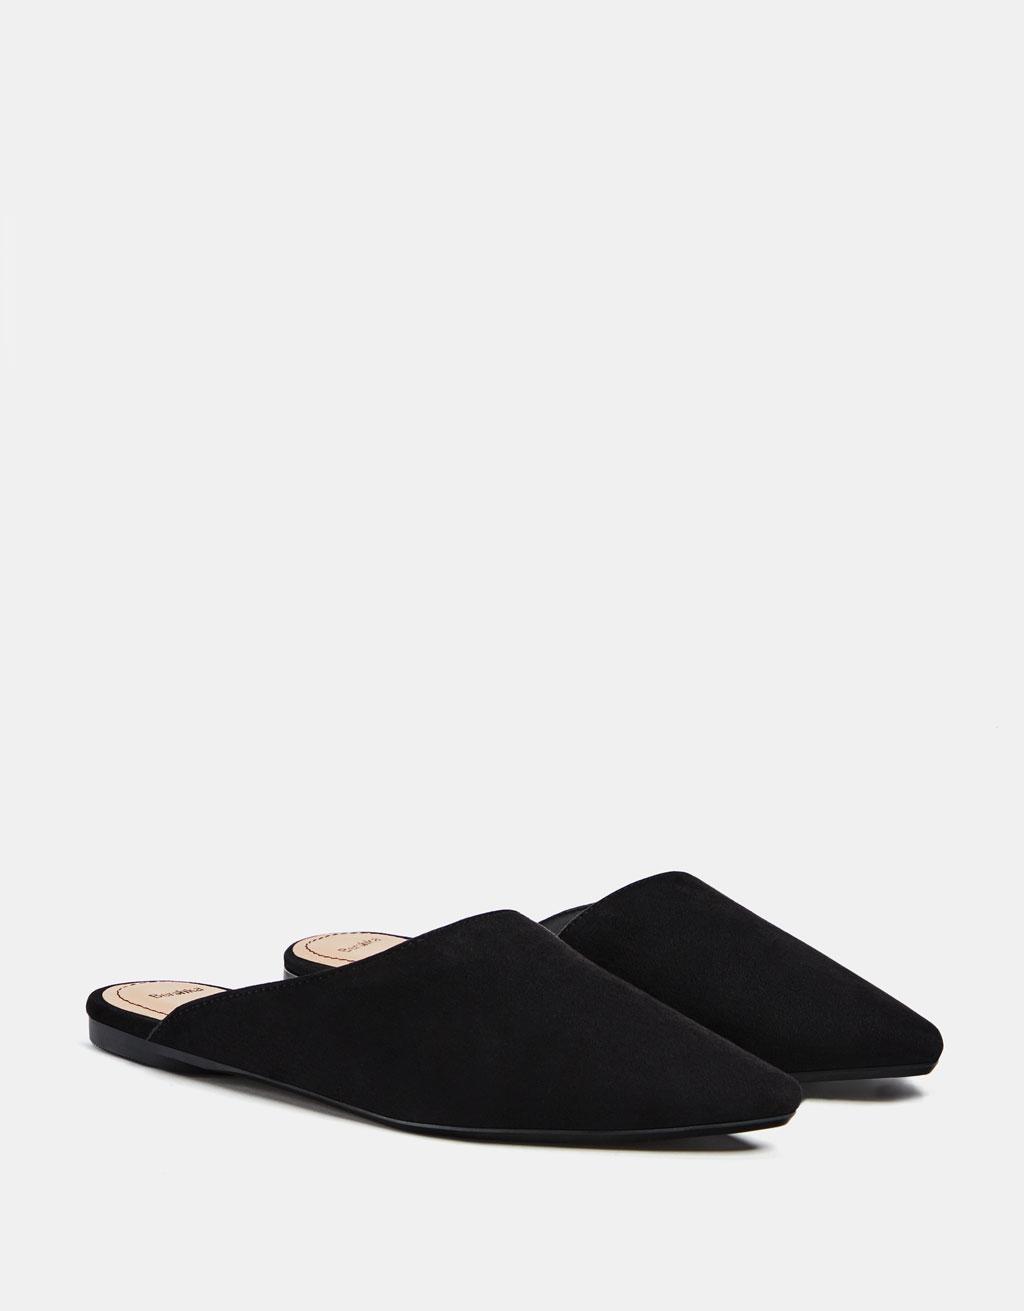 Zapato plano asimétrico